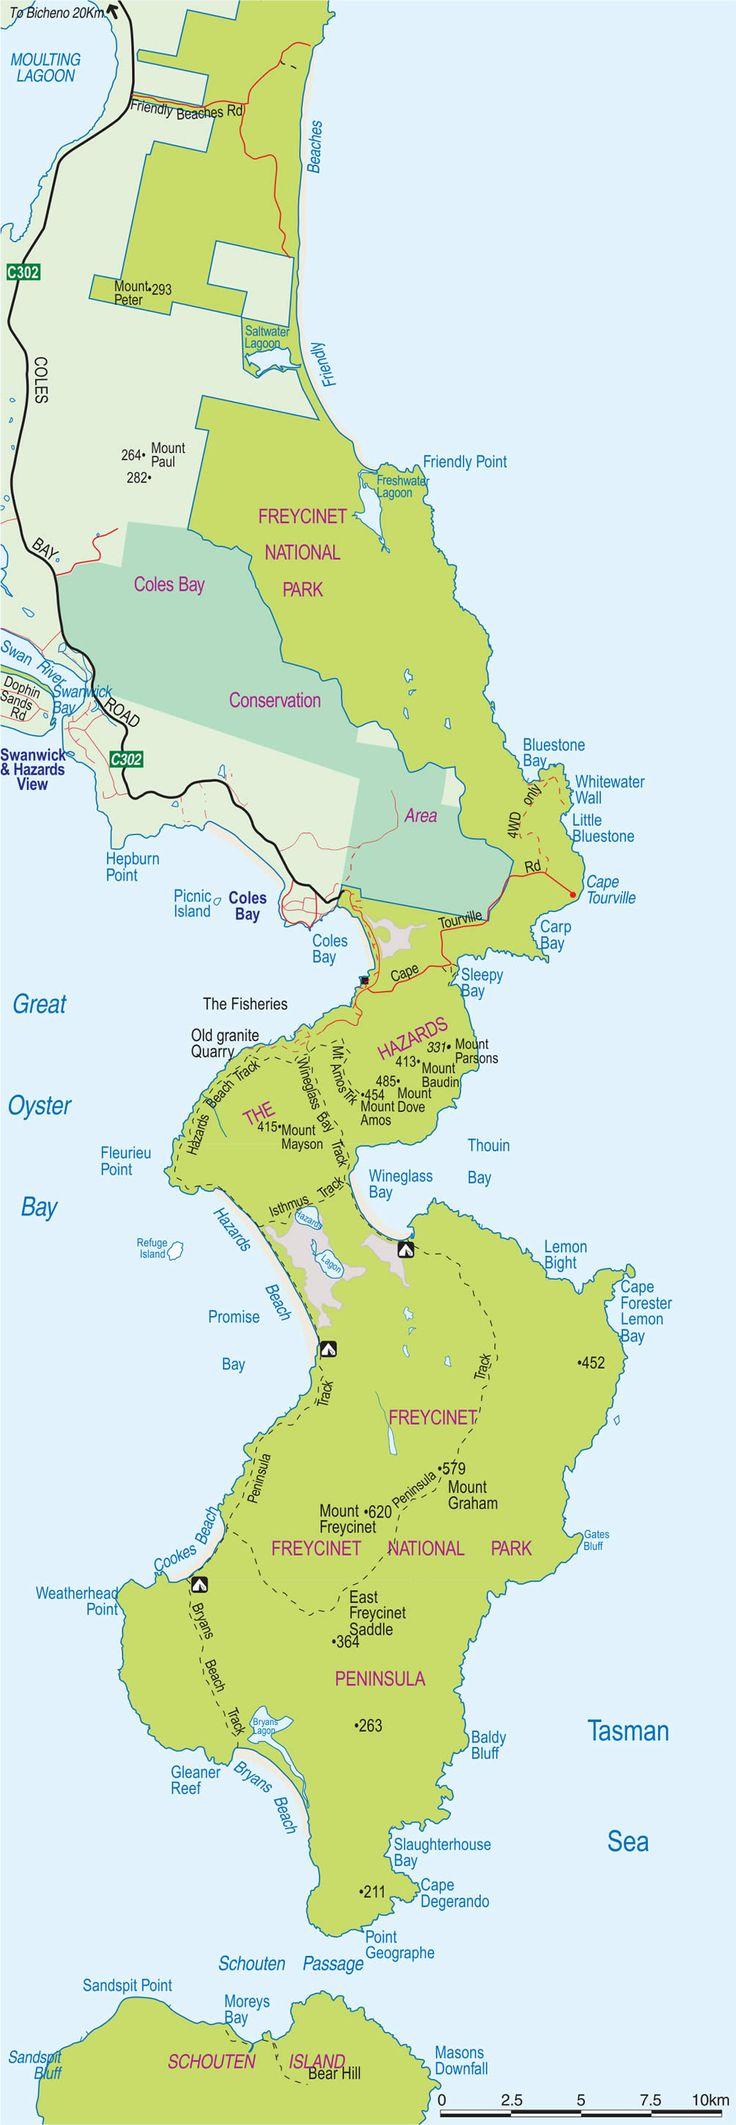 Freycinet National Park Map, Tasmania, Australia.